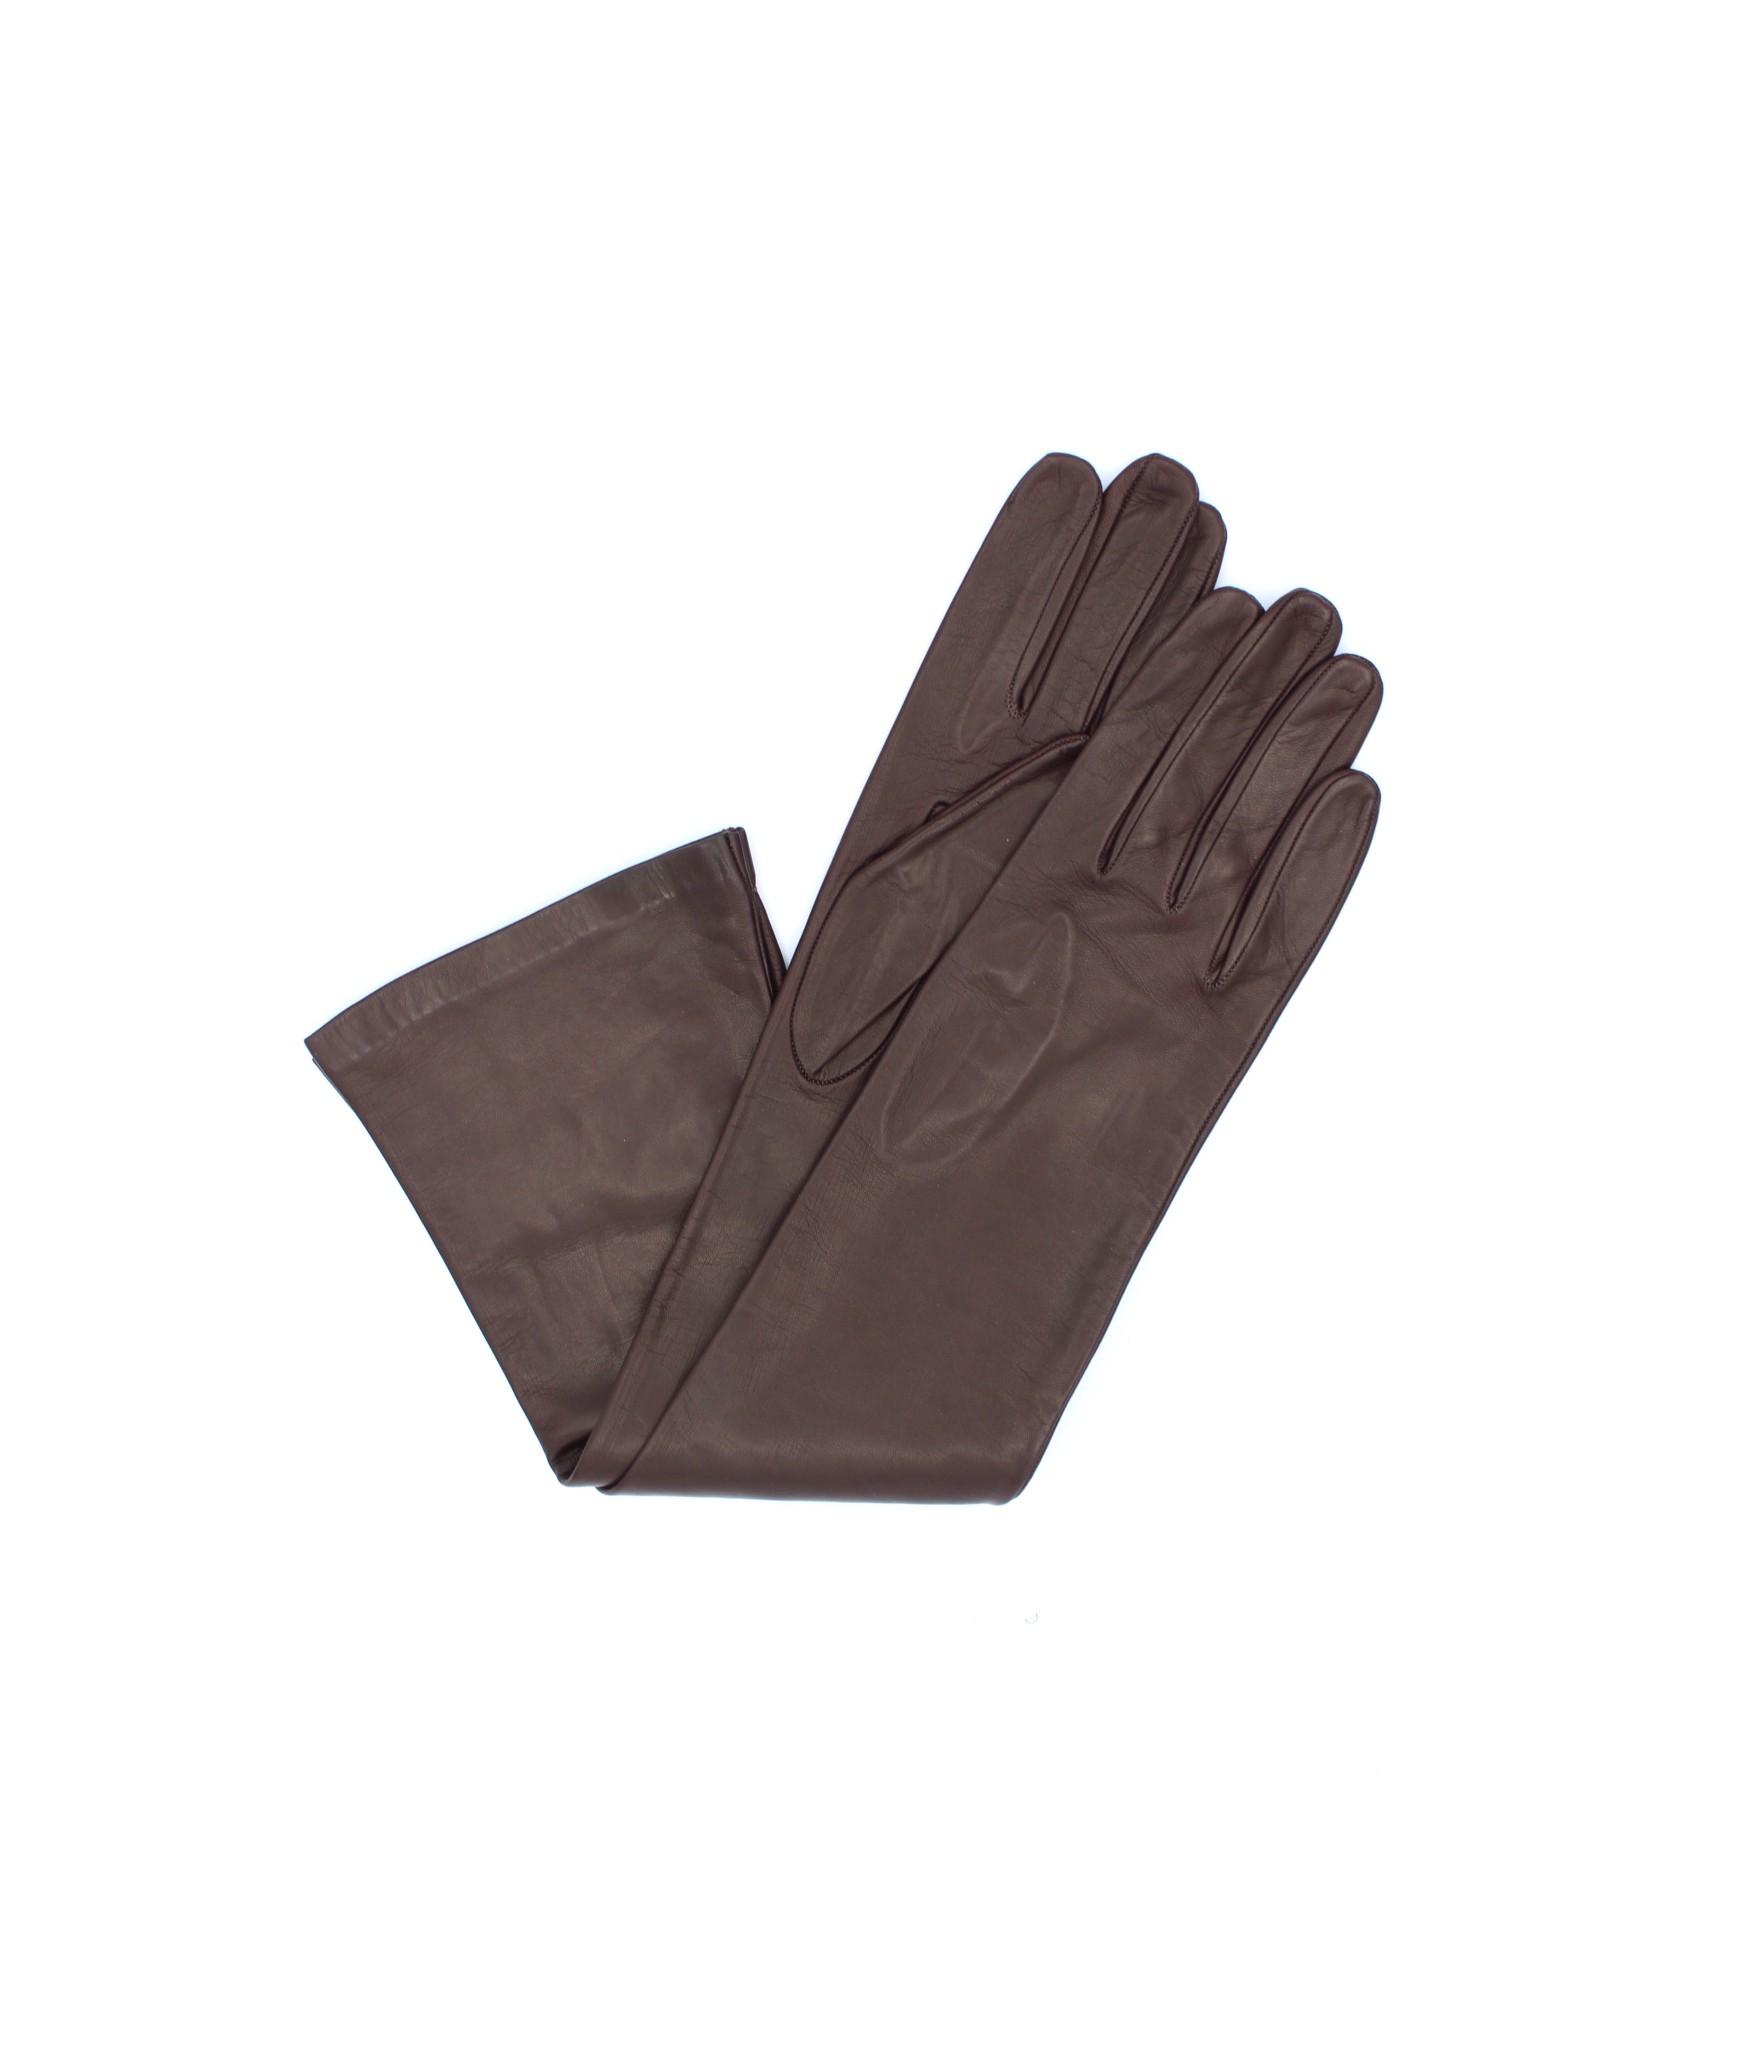 Nappa leather gloves 10bt silk lined Bordeaux Sermoneta Gloves